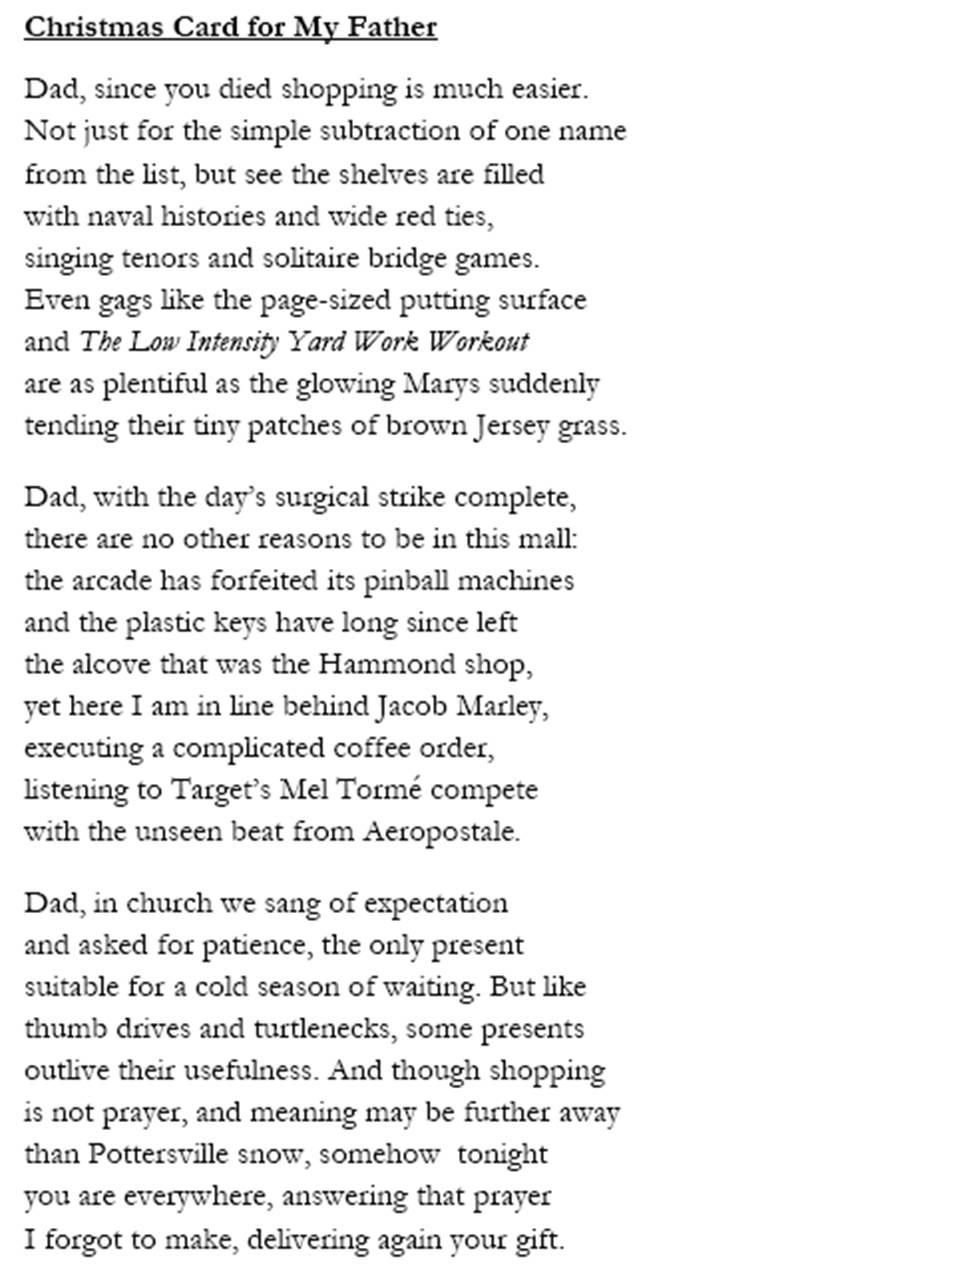 cosmic liverwurst the christmas poem 2010